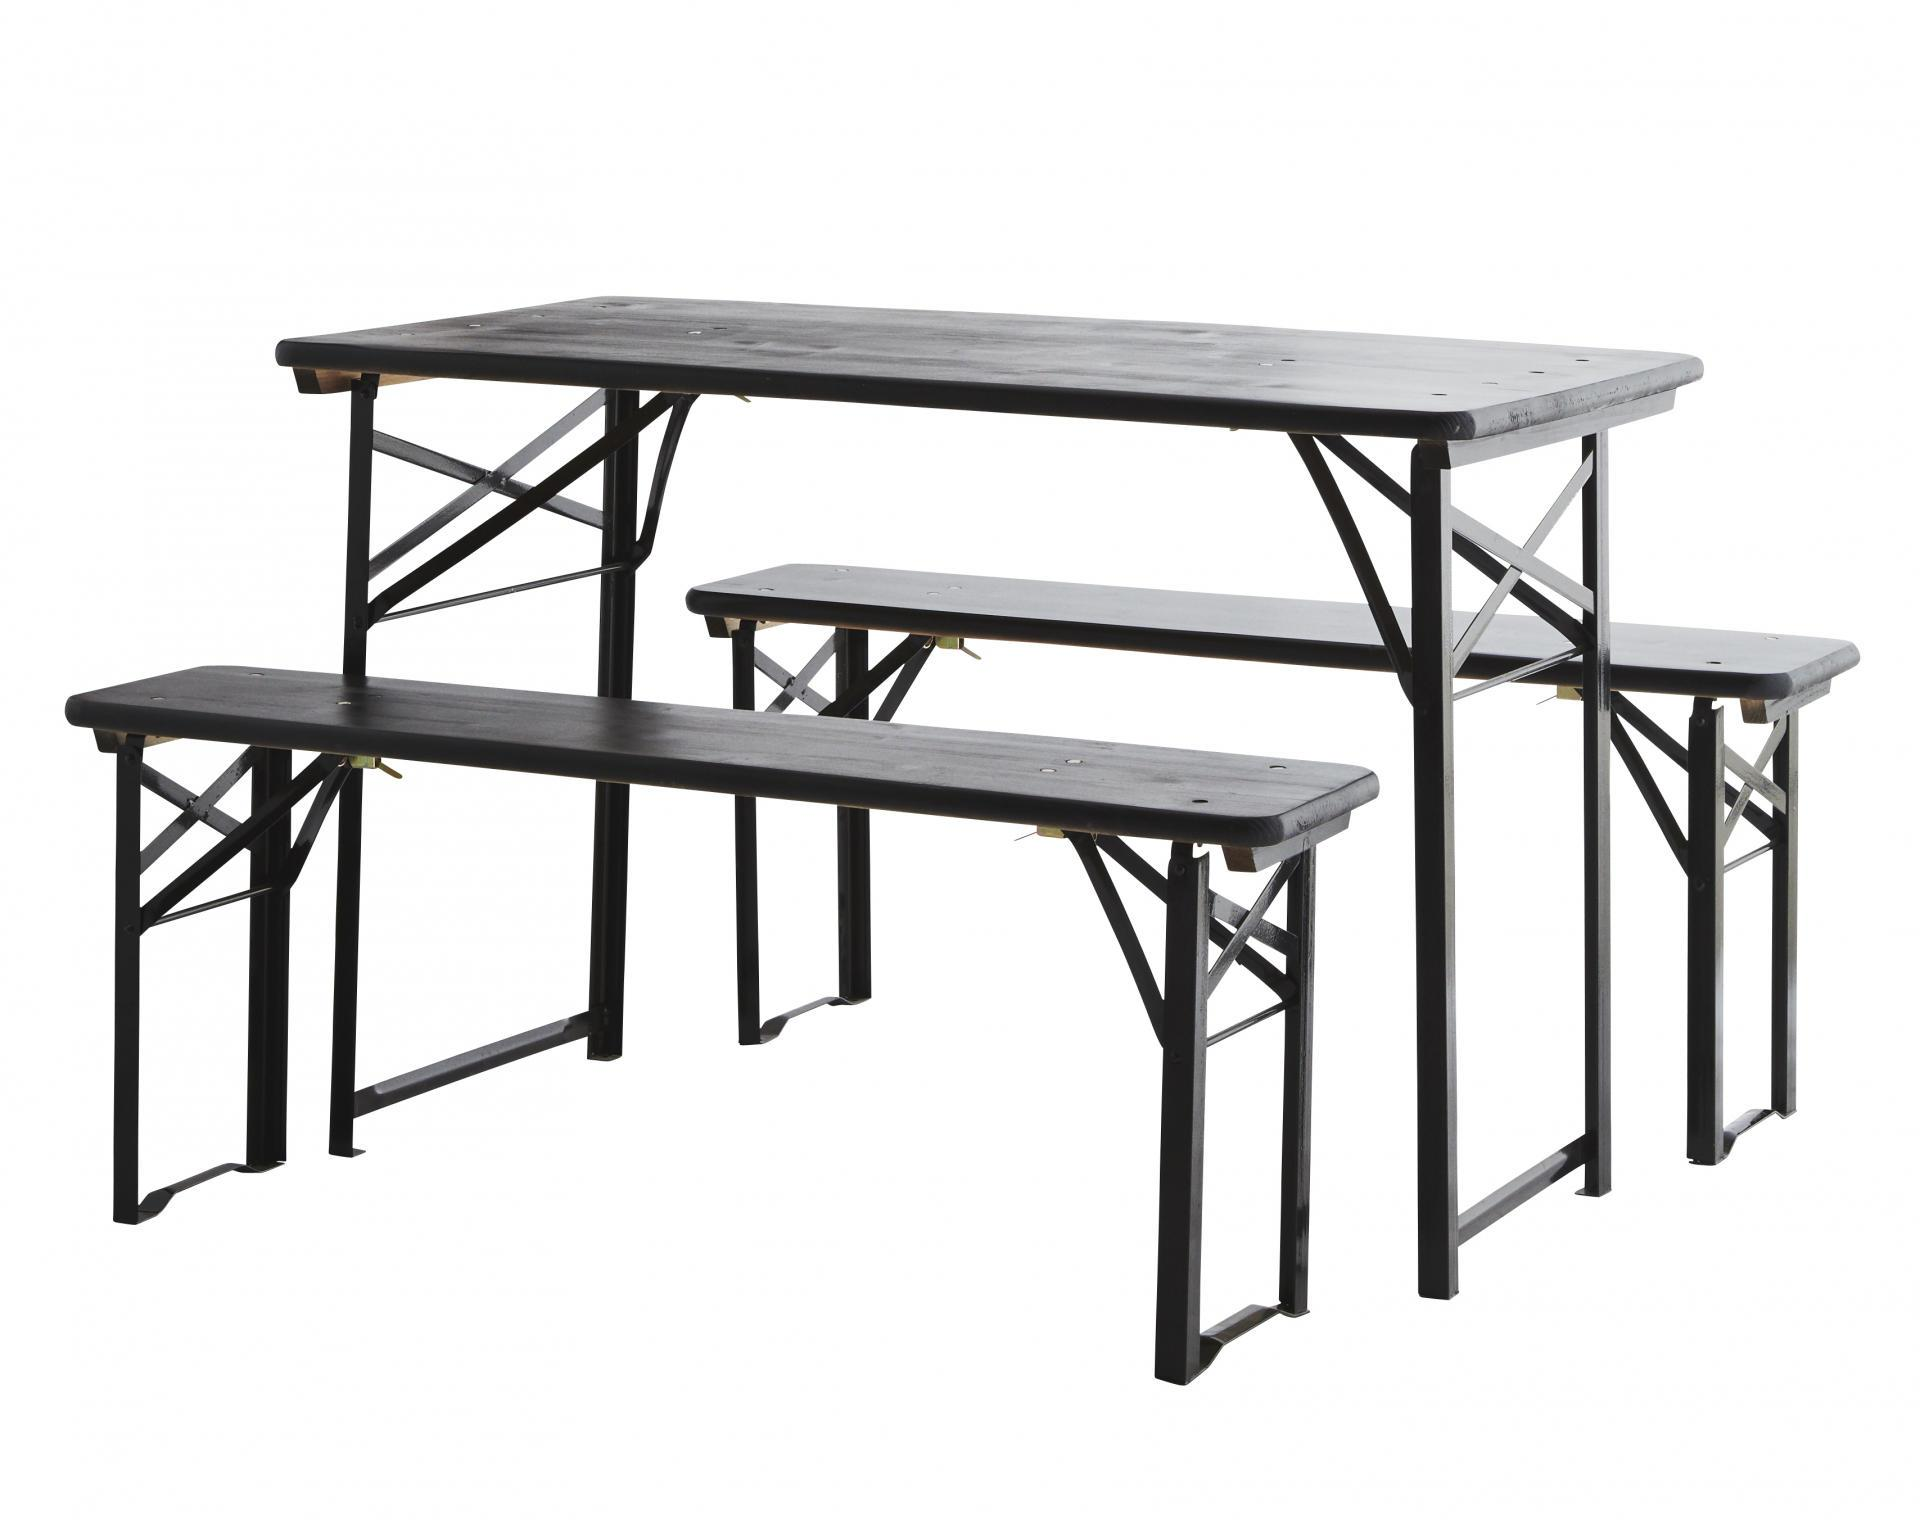 MADAM STOLTZ Lavičky se stolem Black, černá barva, kov